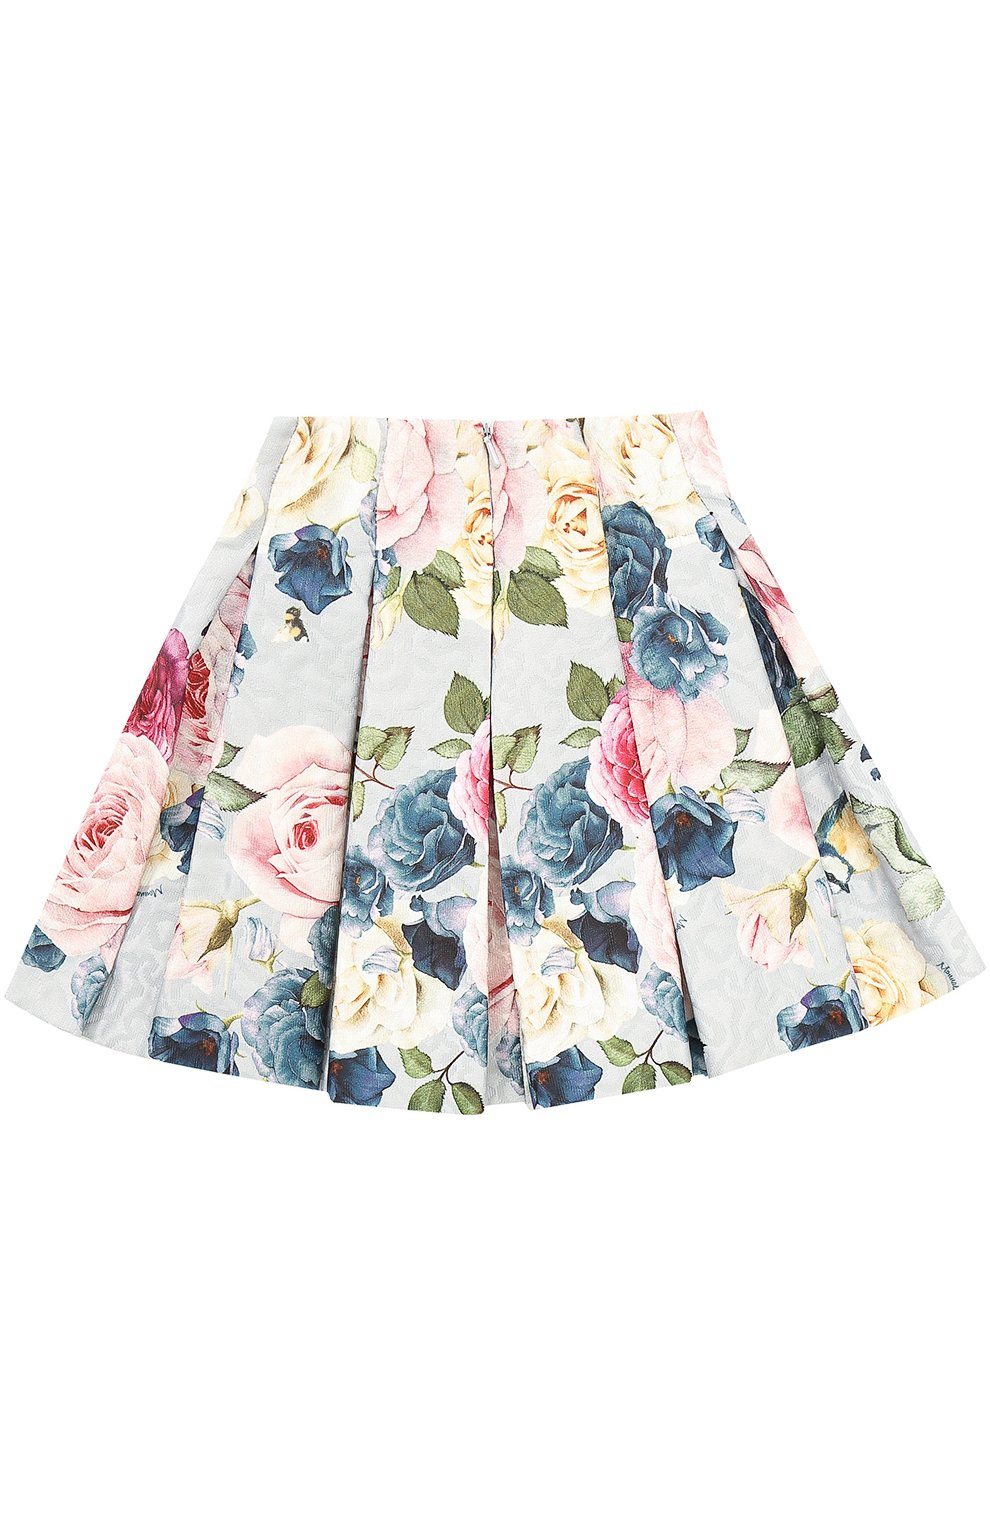 Мини-юбка с защипами и принтом | Фото №2